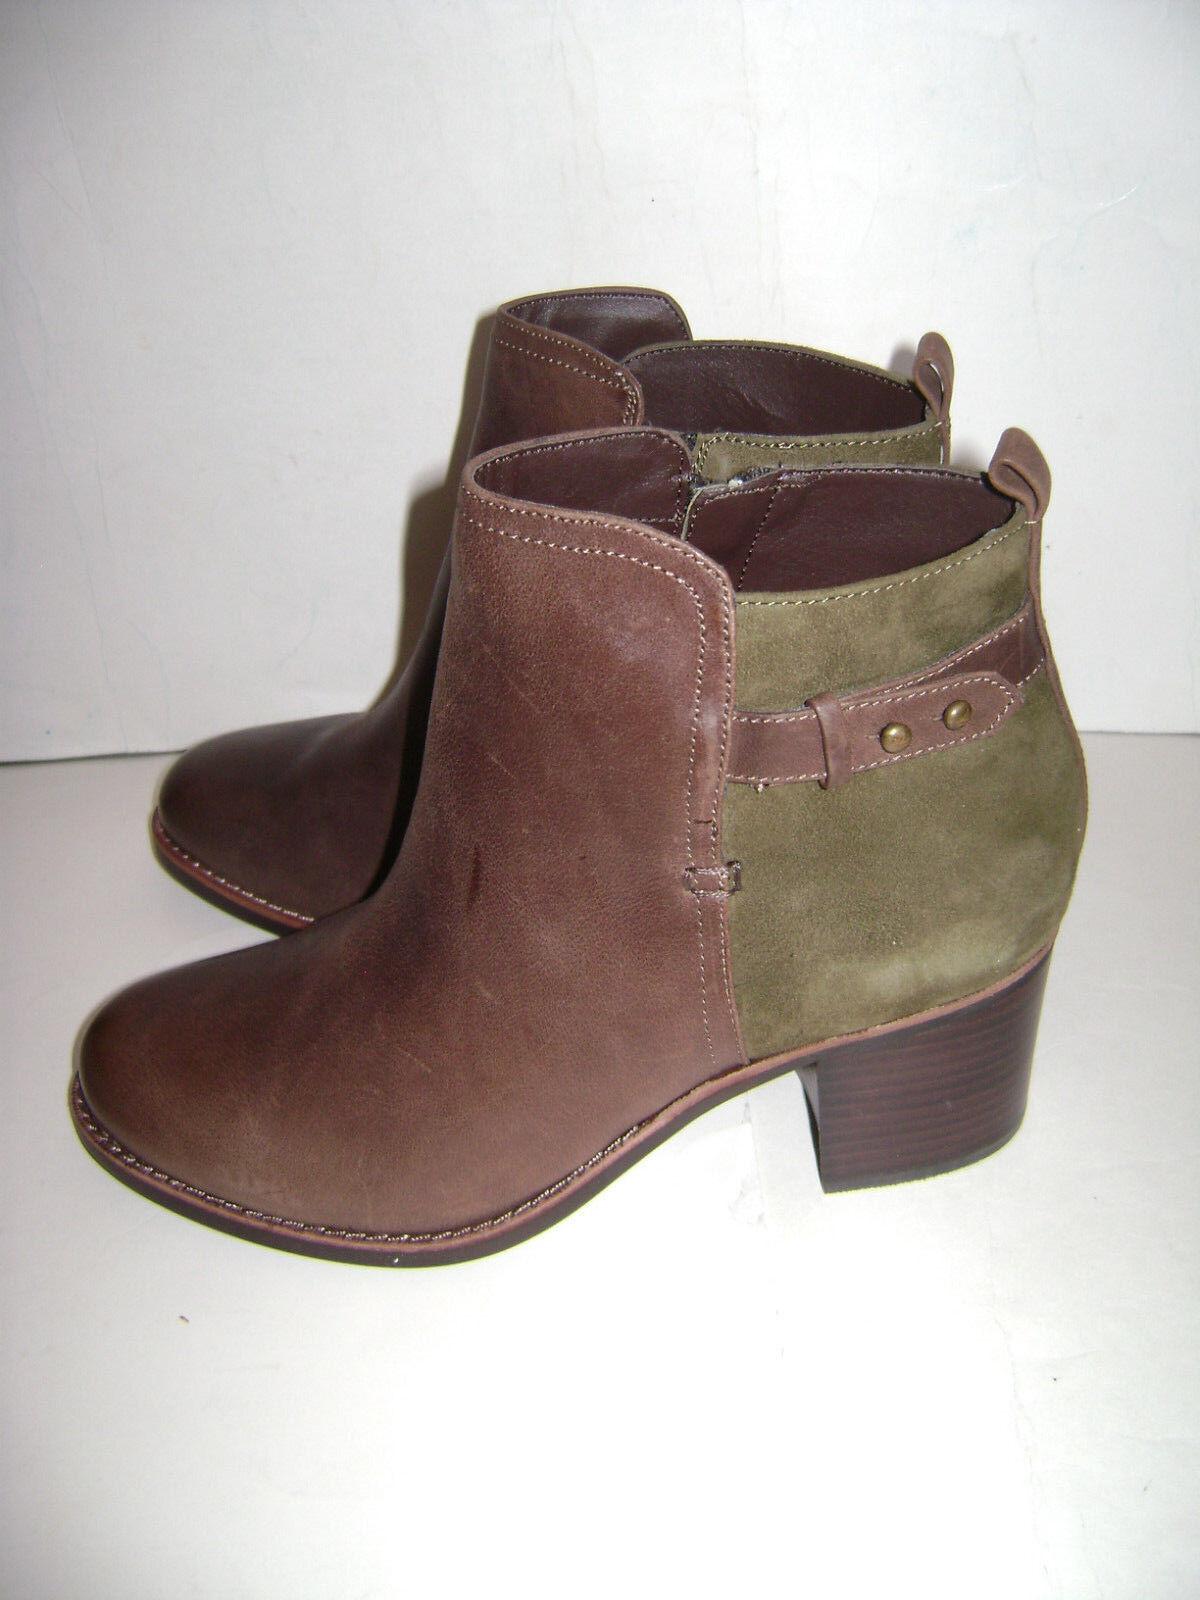 NIB SPERRY TOP Damens SIDER AMBROSE ANKLE Stiefel Damens TOP Schuhe Größe 8.5 M BROWN OLIVE 298be4